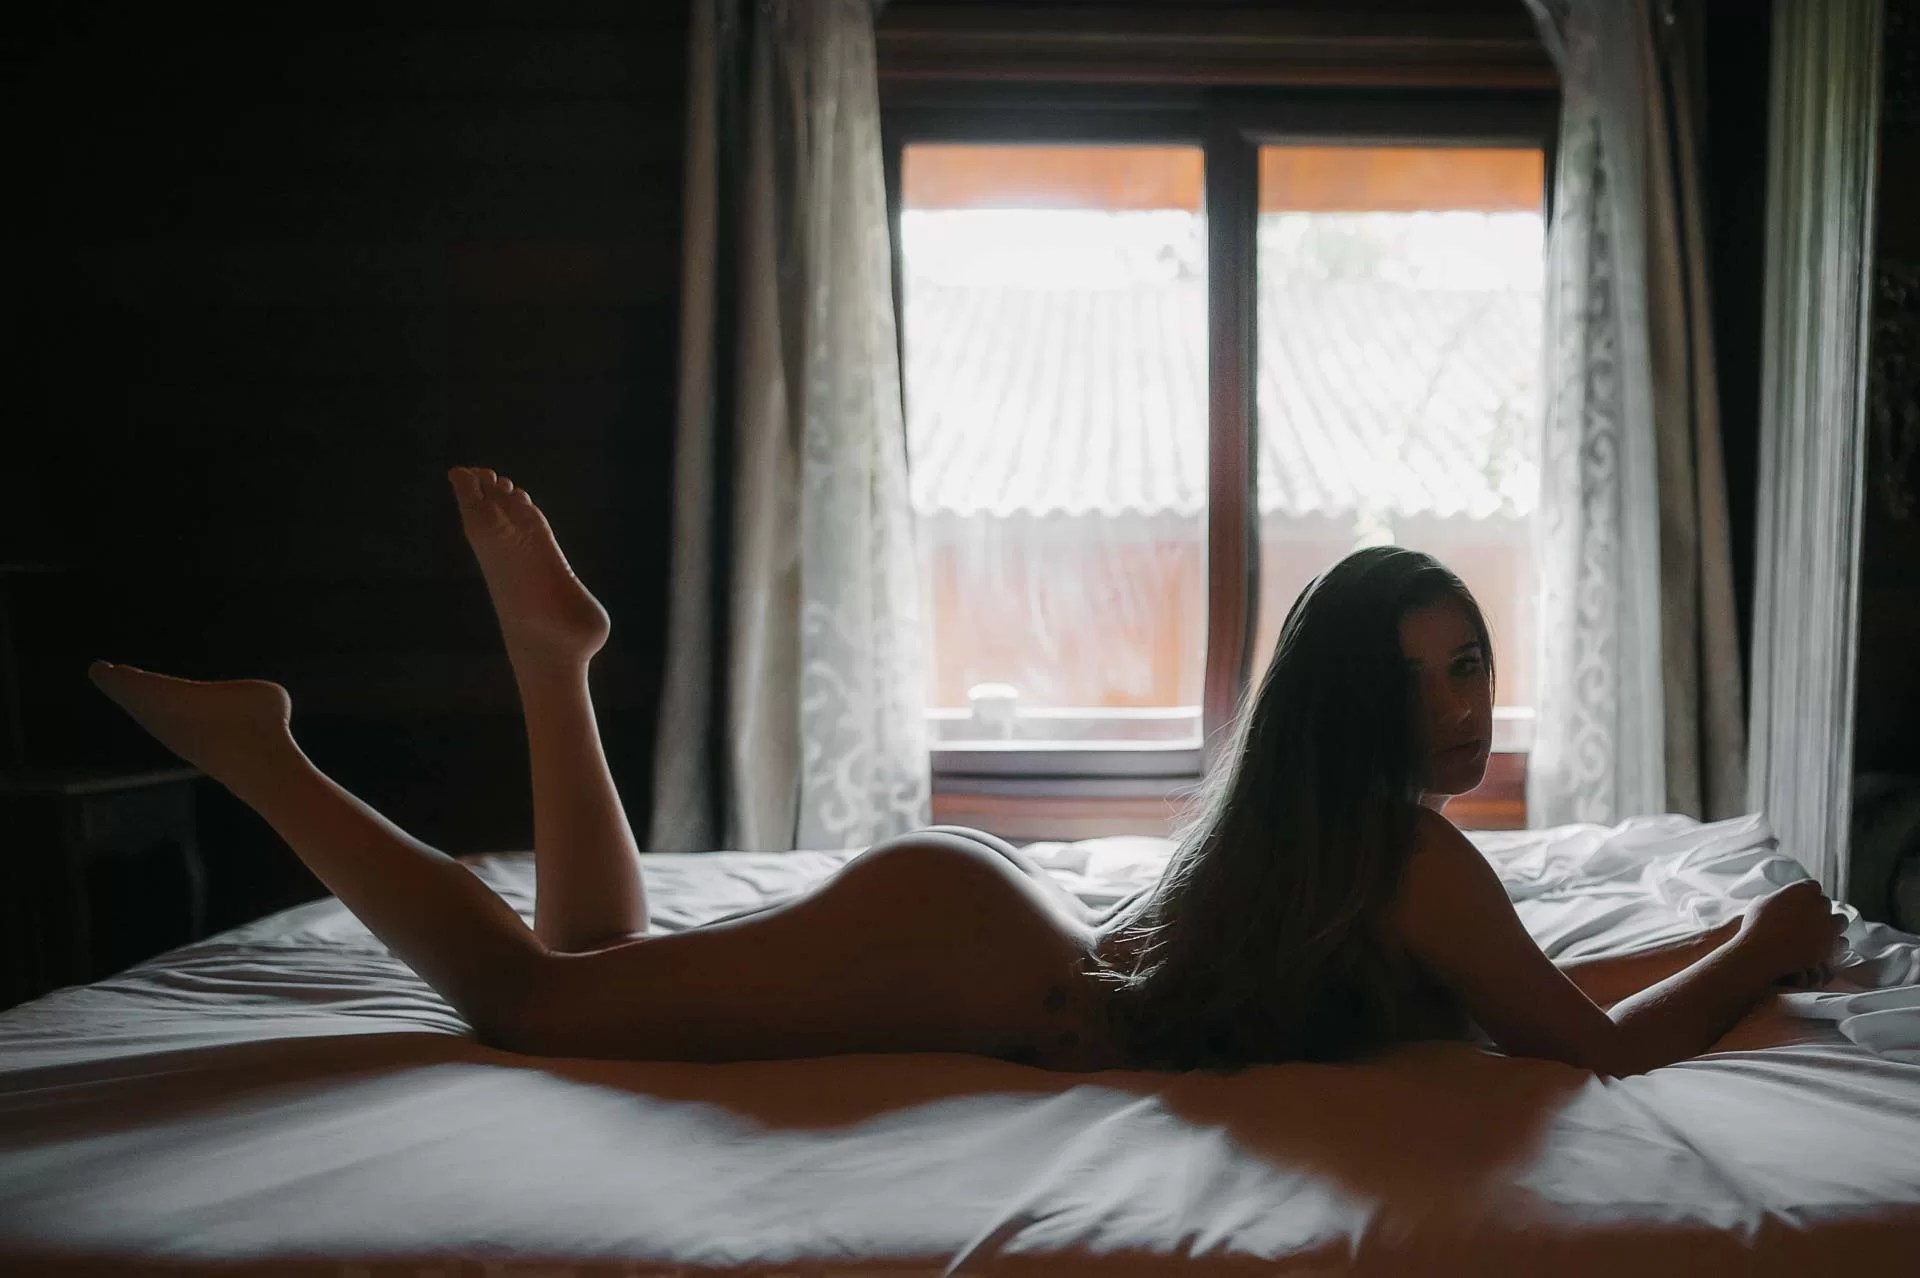 sesión de fotos desnuda sensual